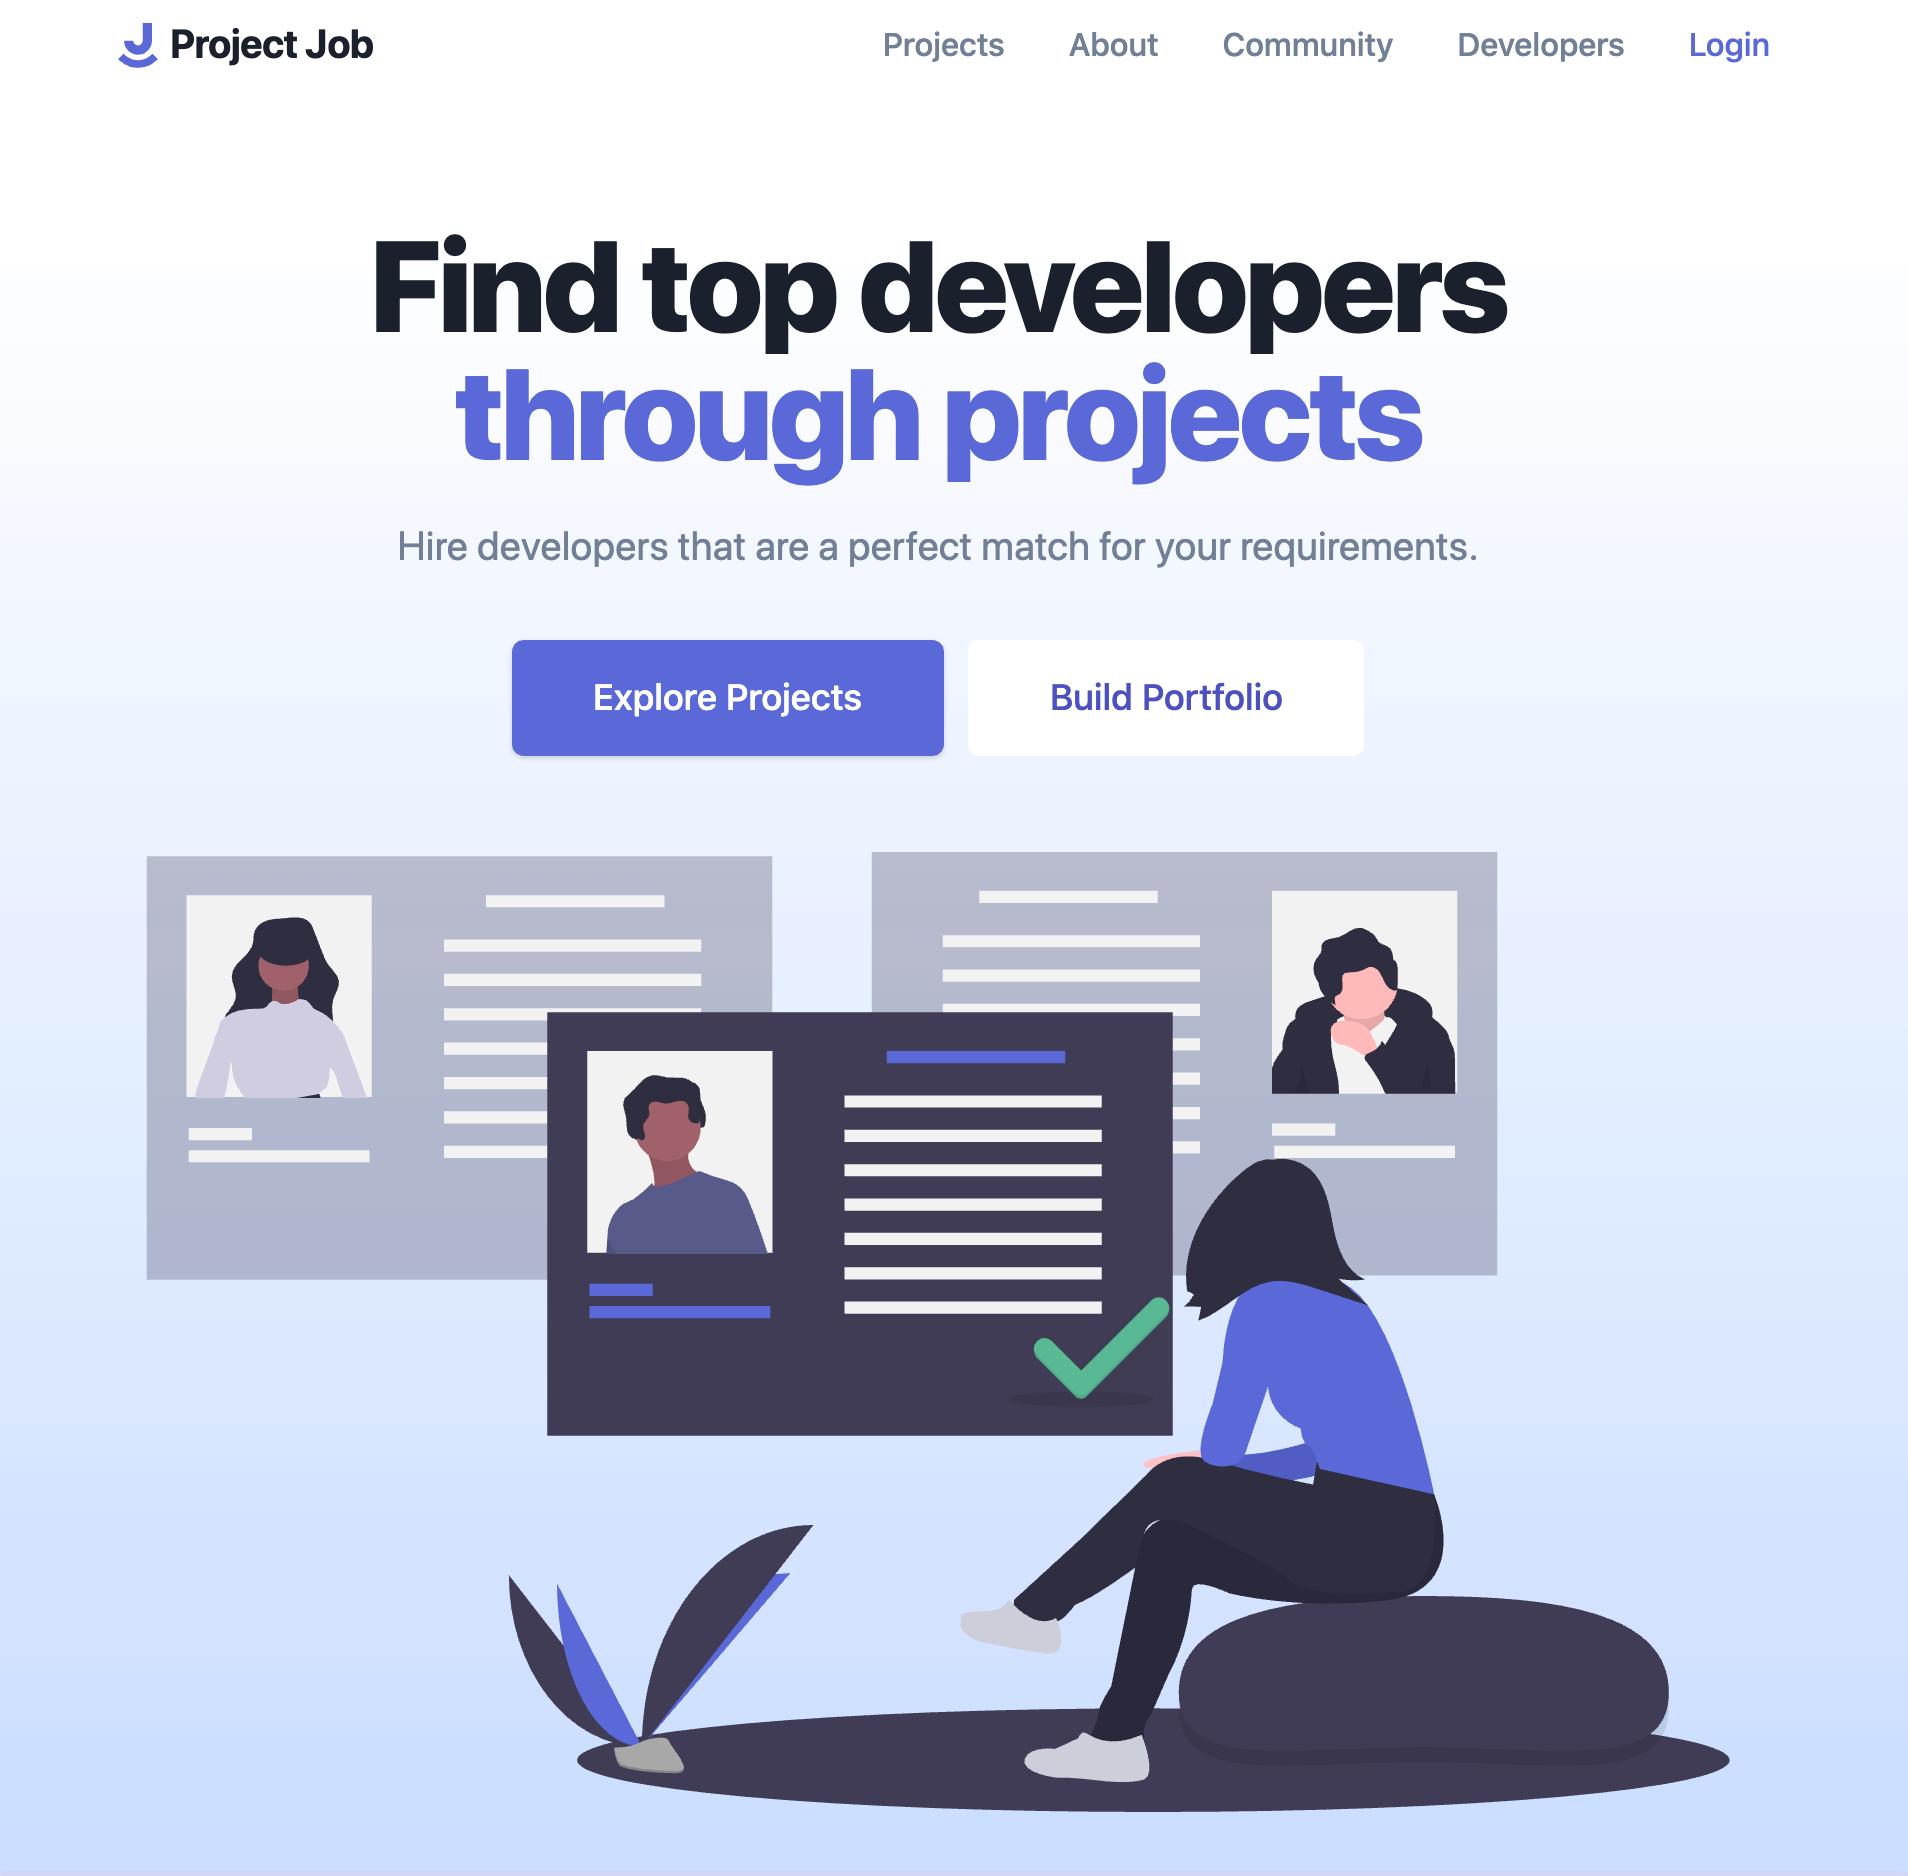 projectjob